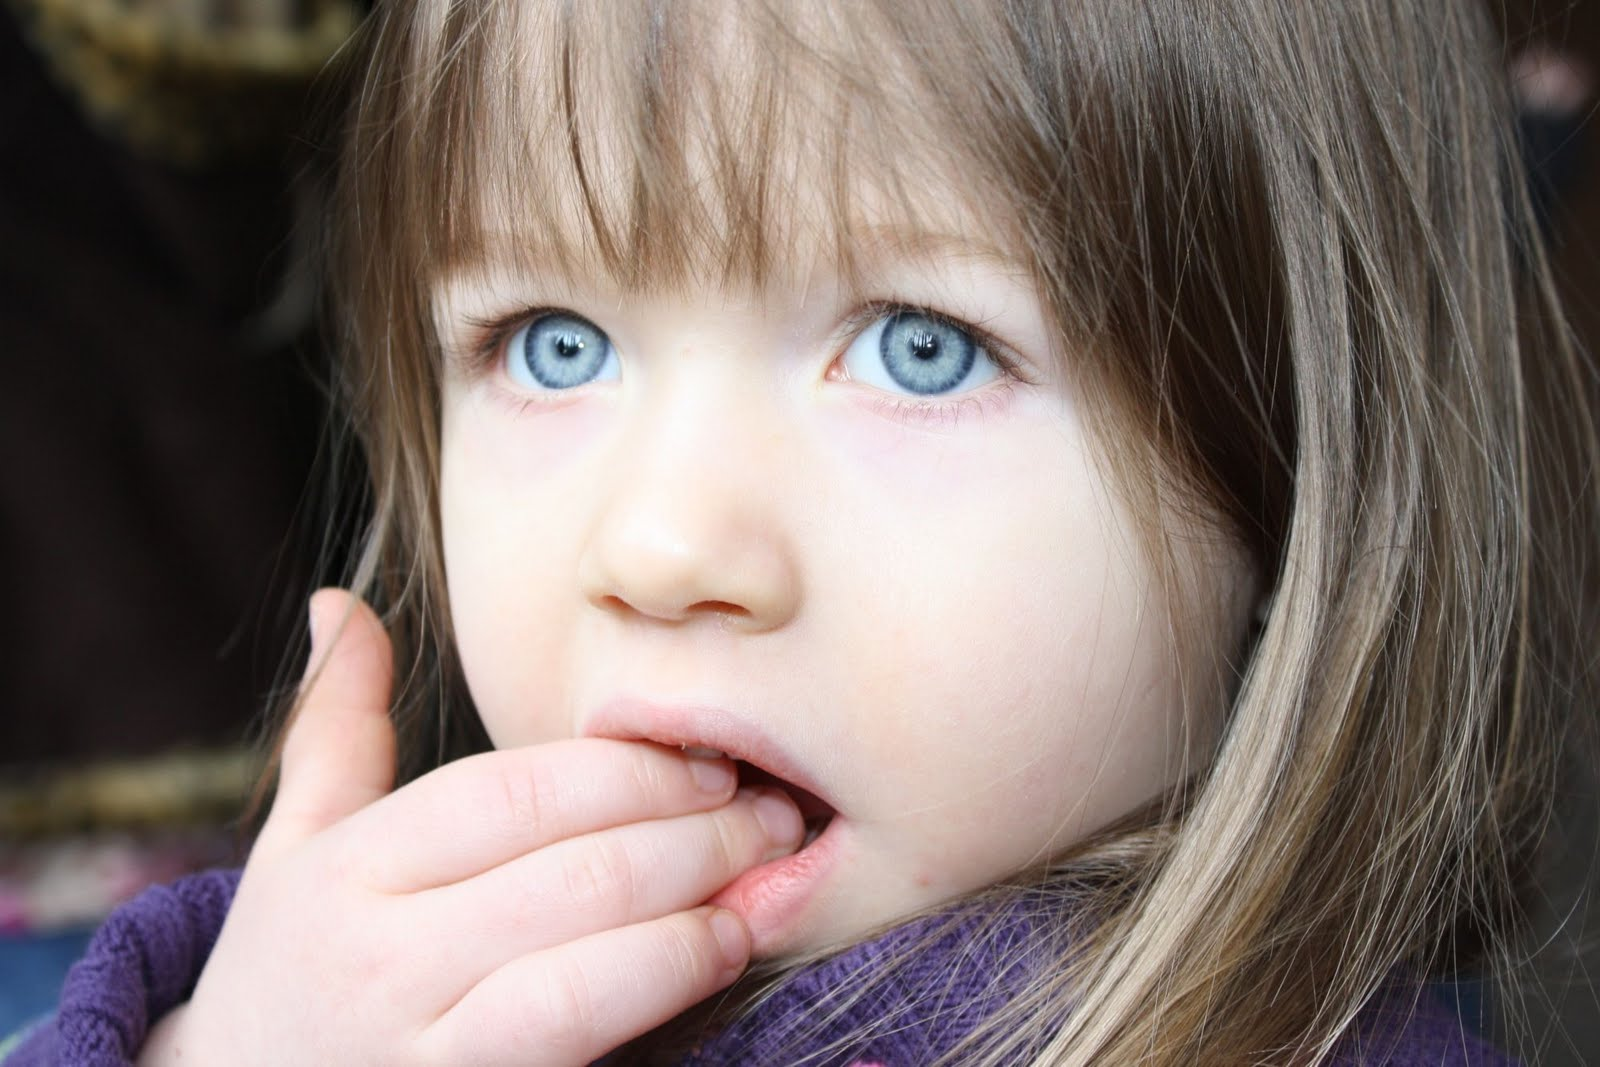 بالصور صور عيون بنات , عيون ساحرة 5746